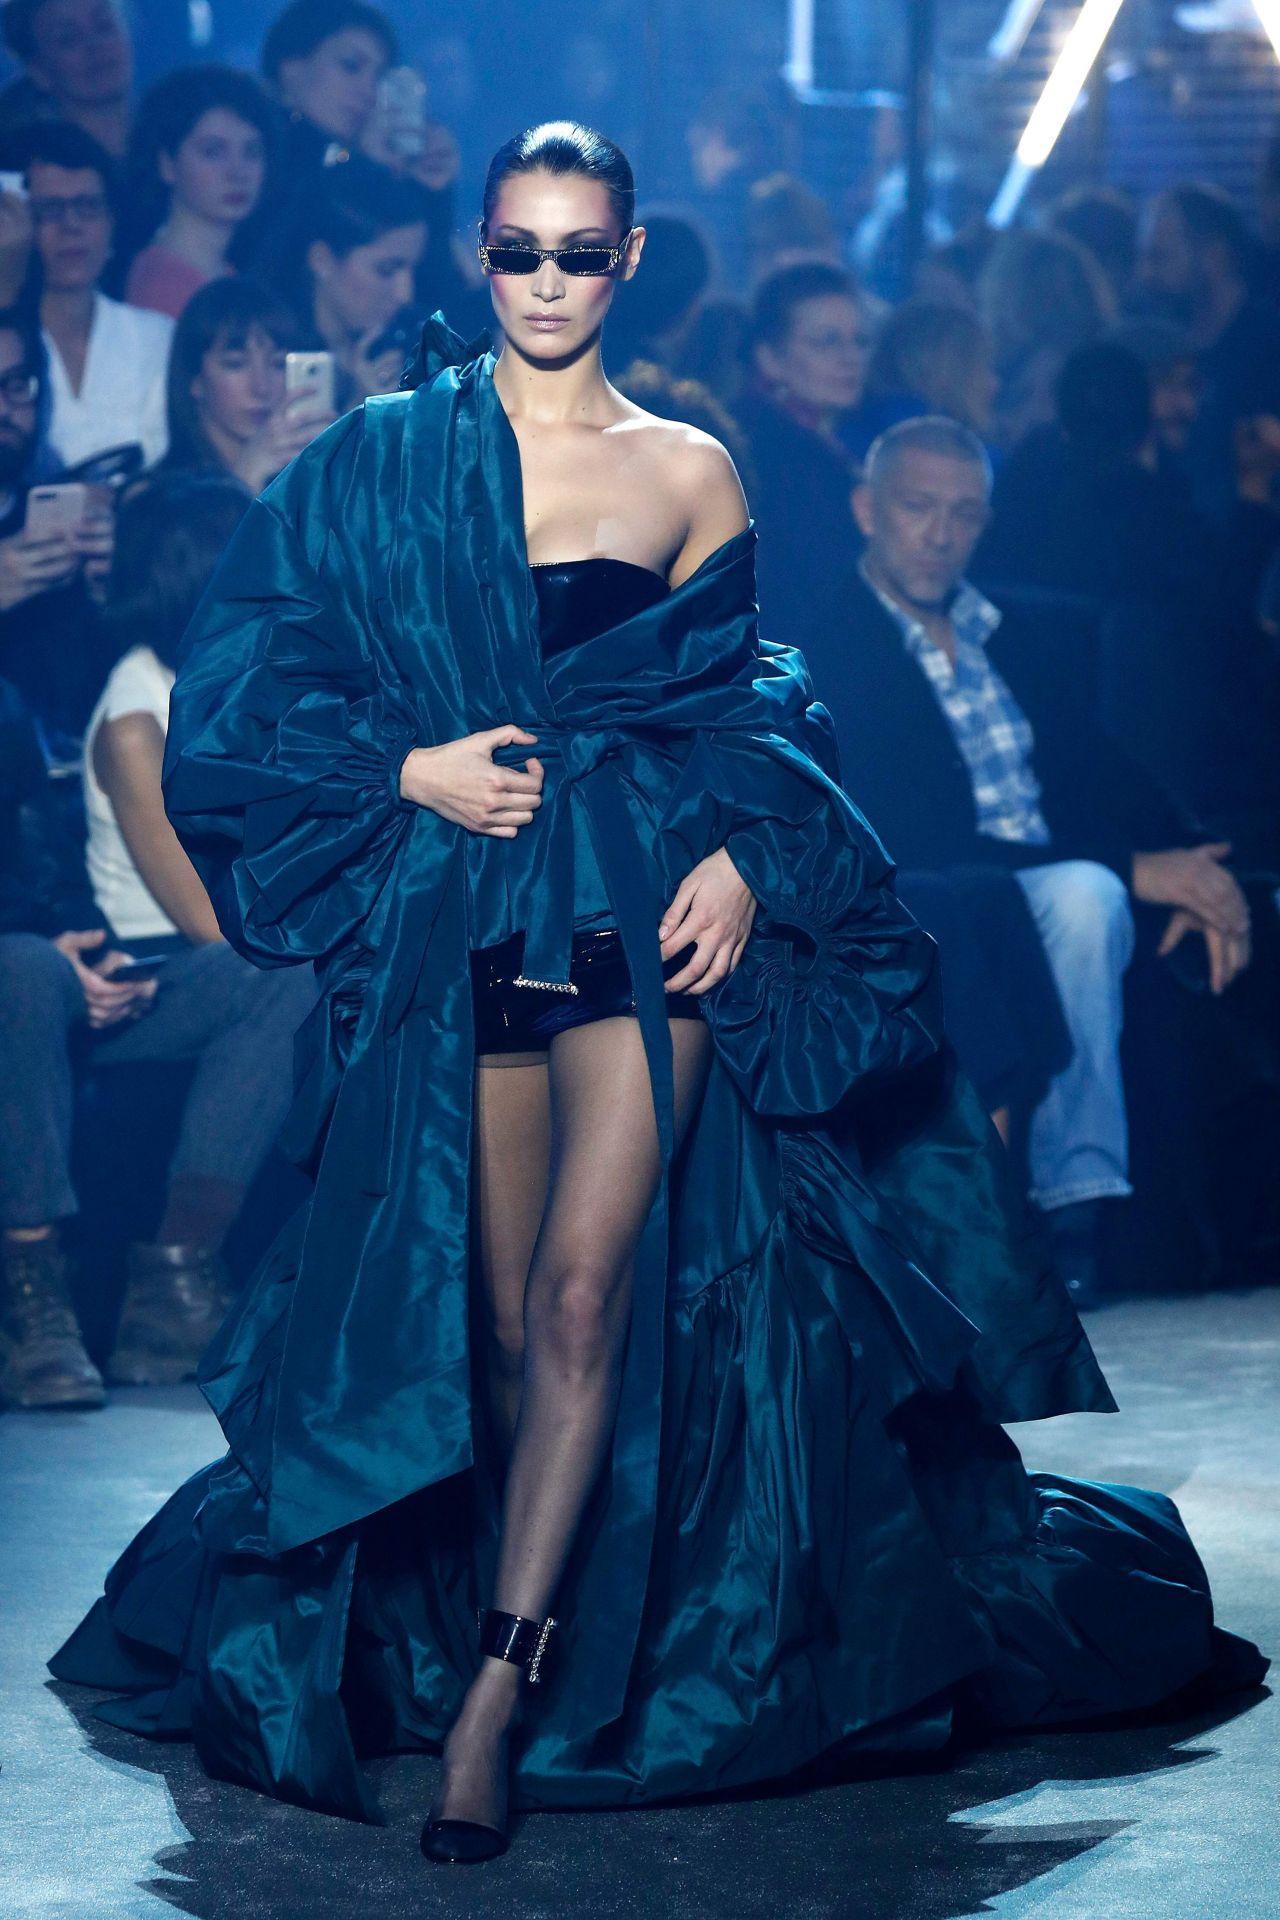 bella paris hadid week couture alexandre vauthier spring haute summer areola peek fappening january hawtcelebs